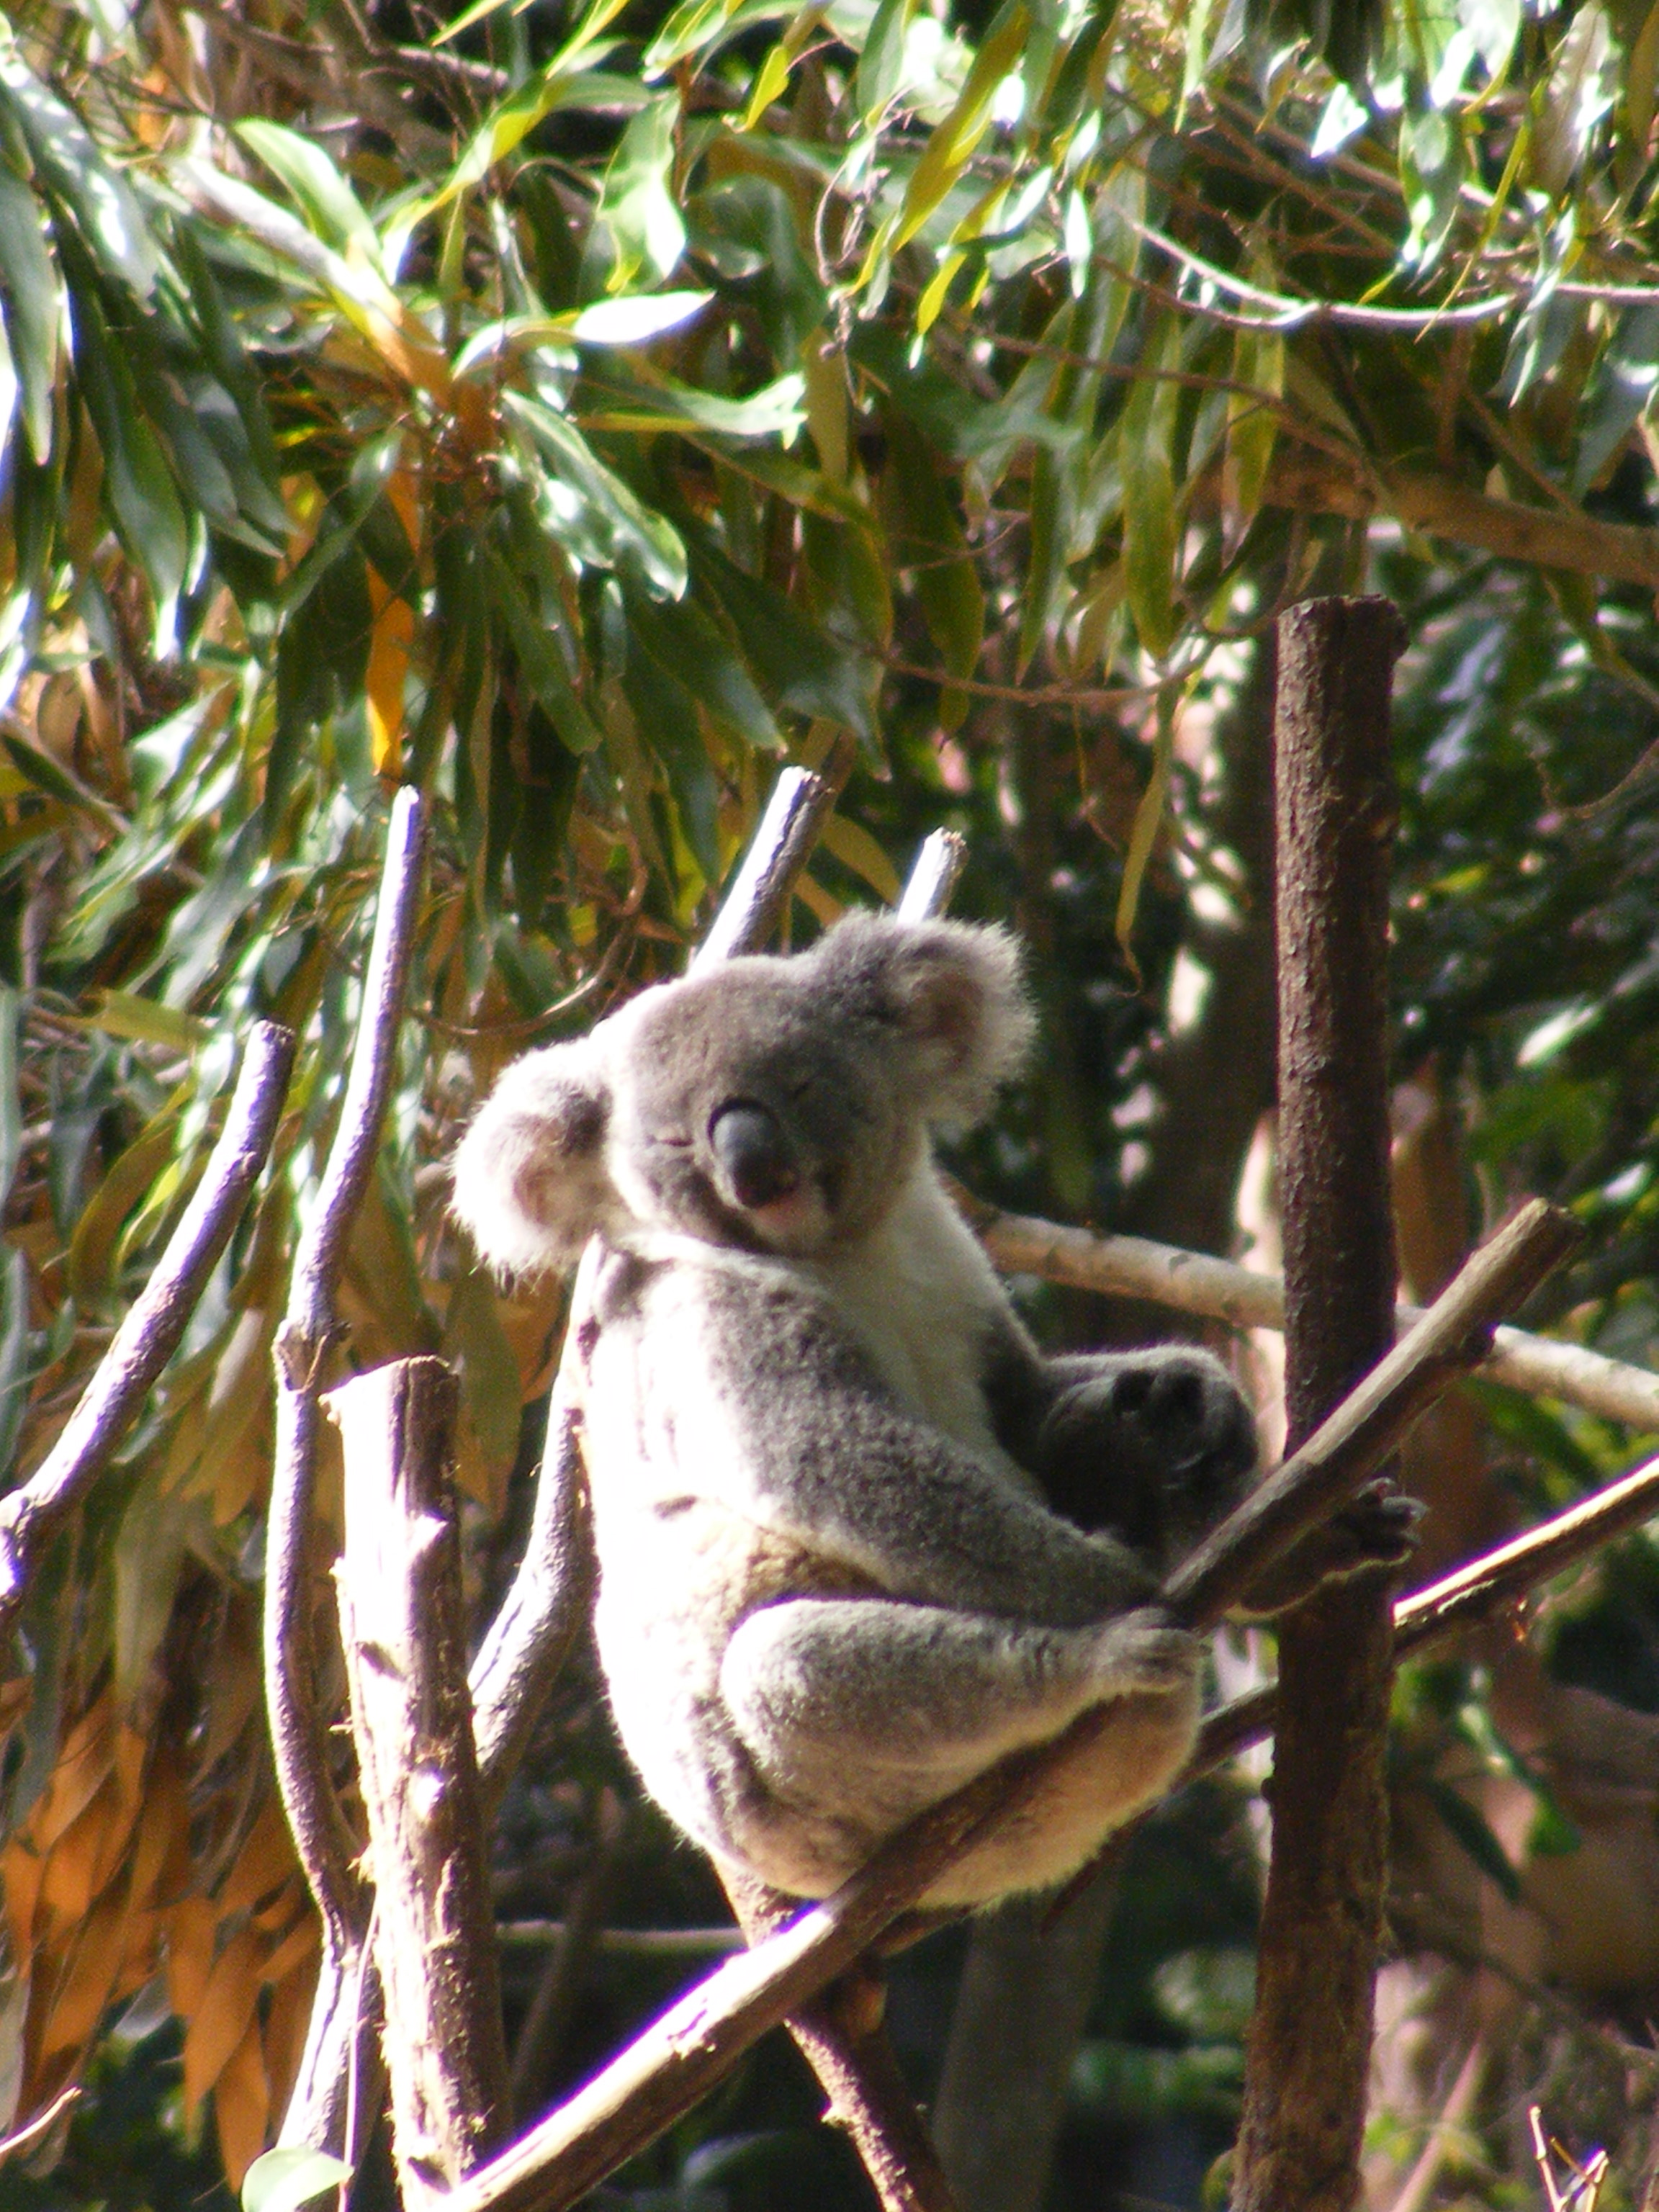 Koala at the Currumbin Sanctuary